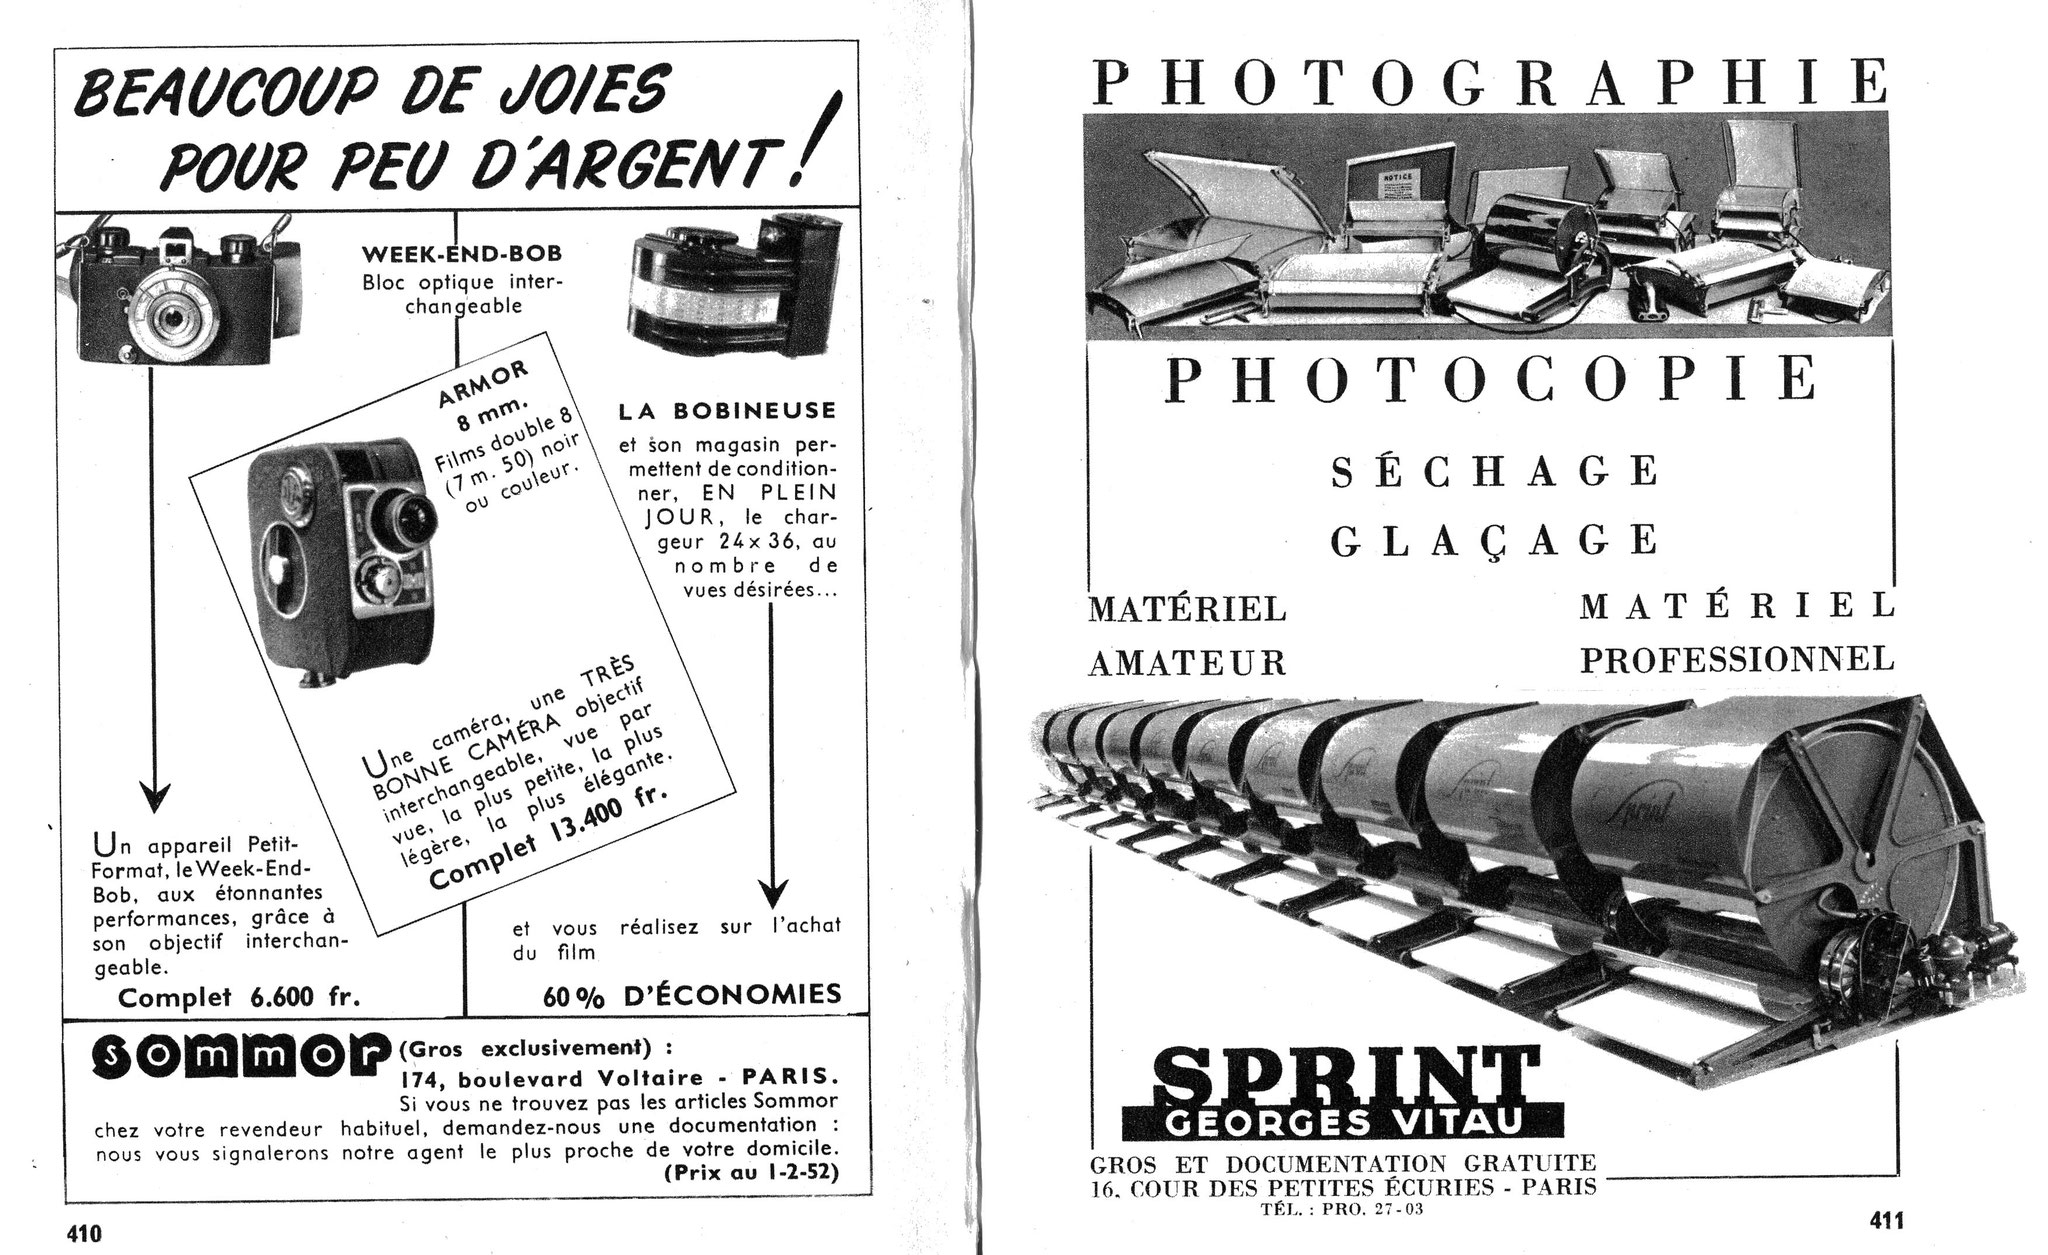 Extraits du guide PRISMA 1951